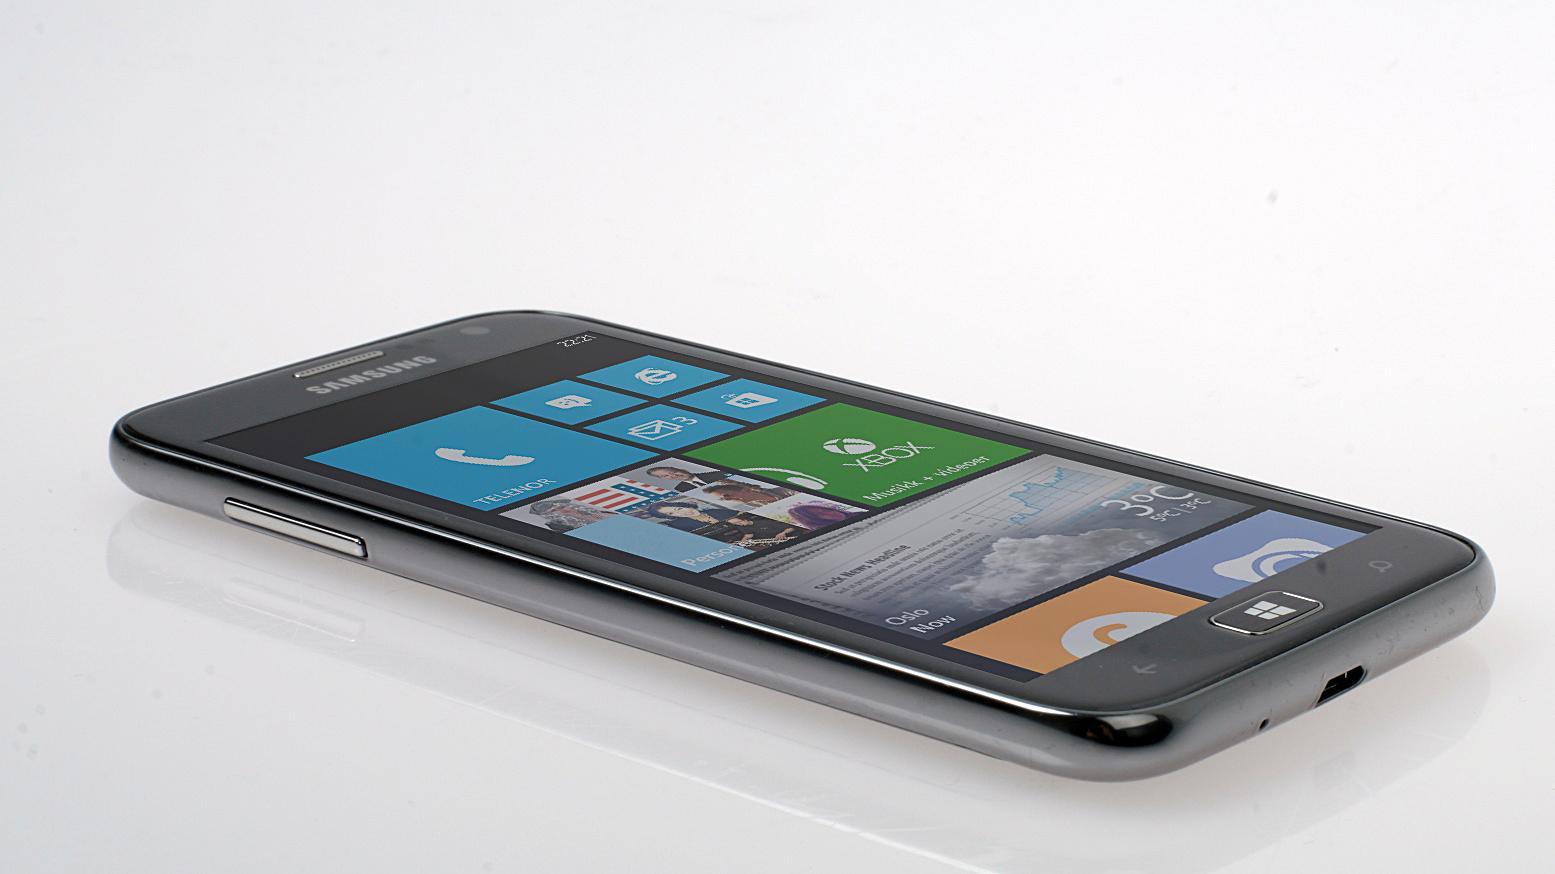 Samsung Ativ S. Foto: Kurt Lekanger, Amobil.no